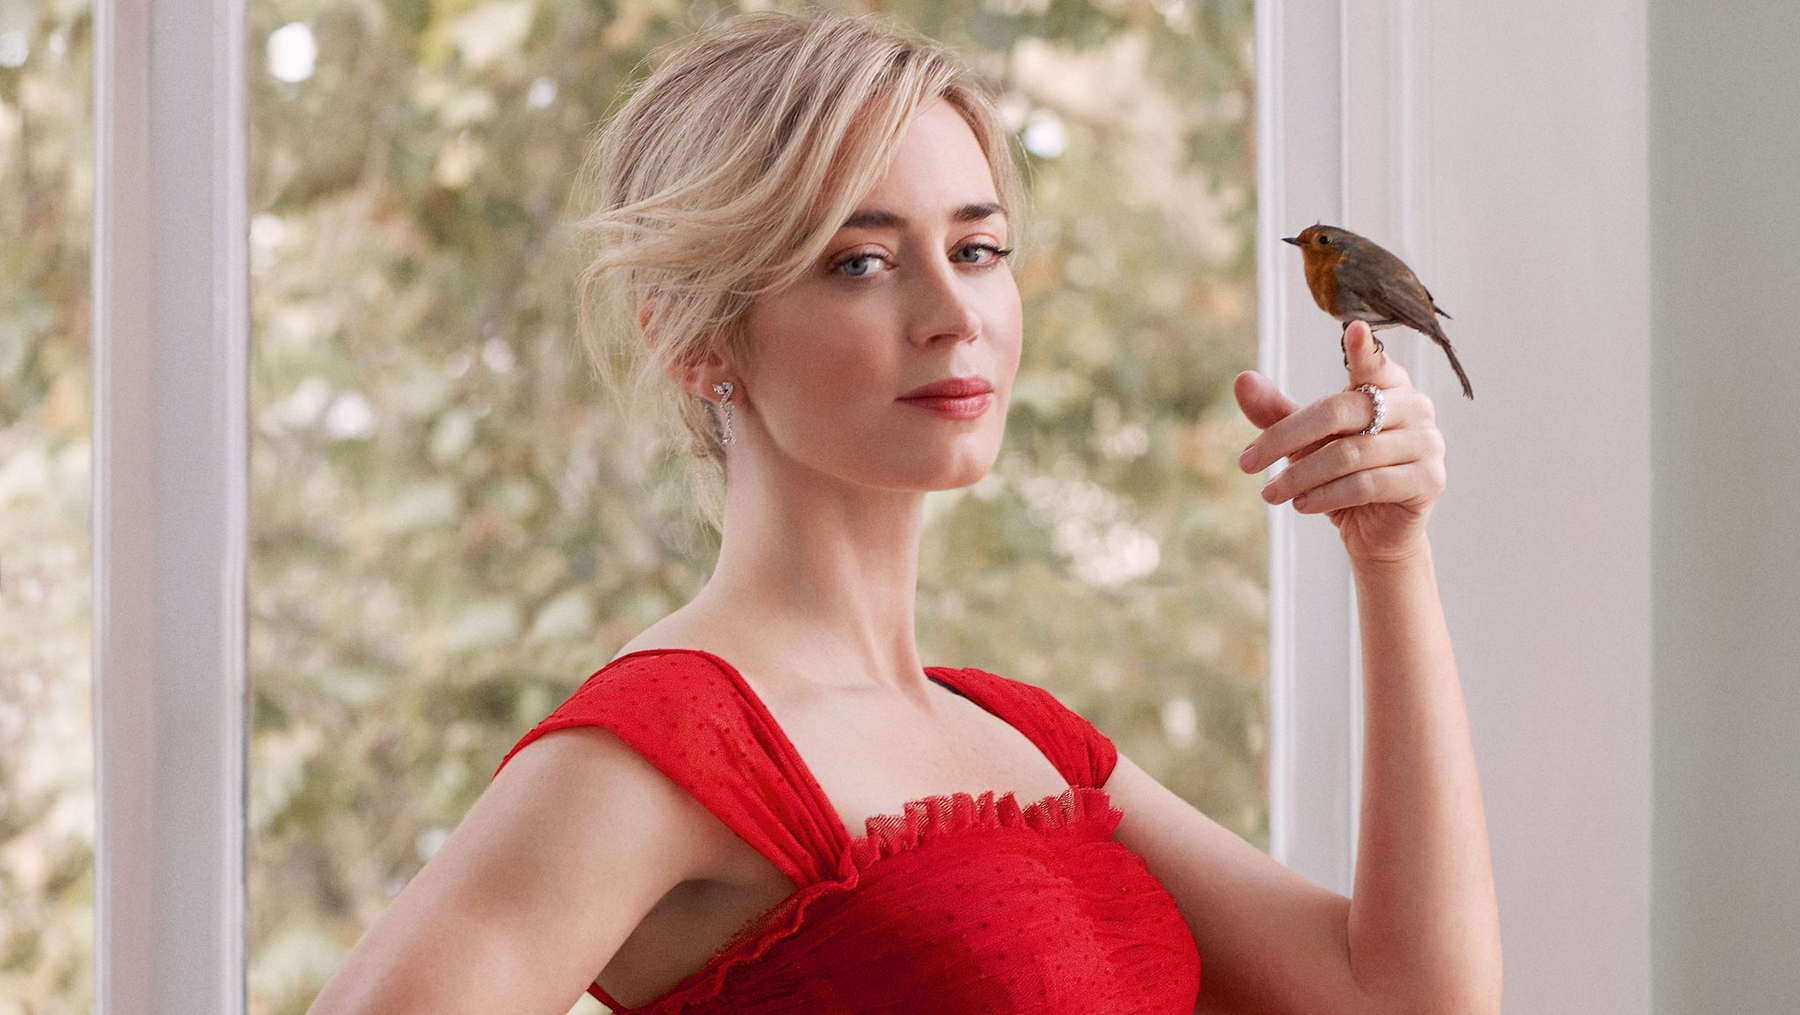 Emily-Blunt-Harpers-Bazaar-UK-January-20191.jpg